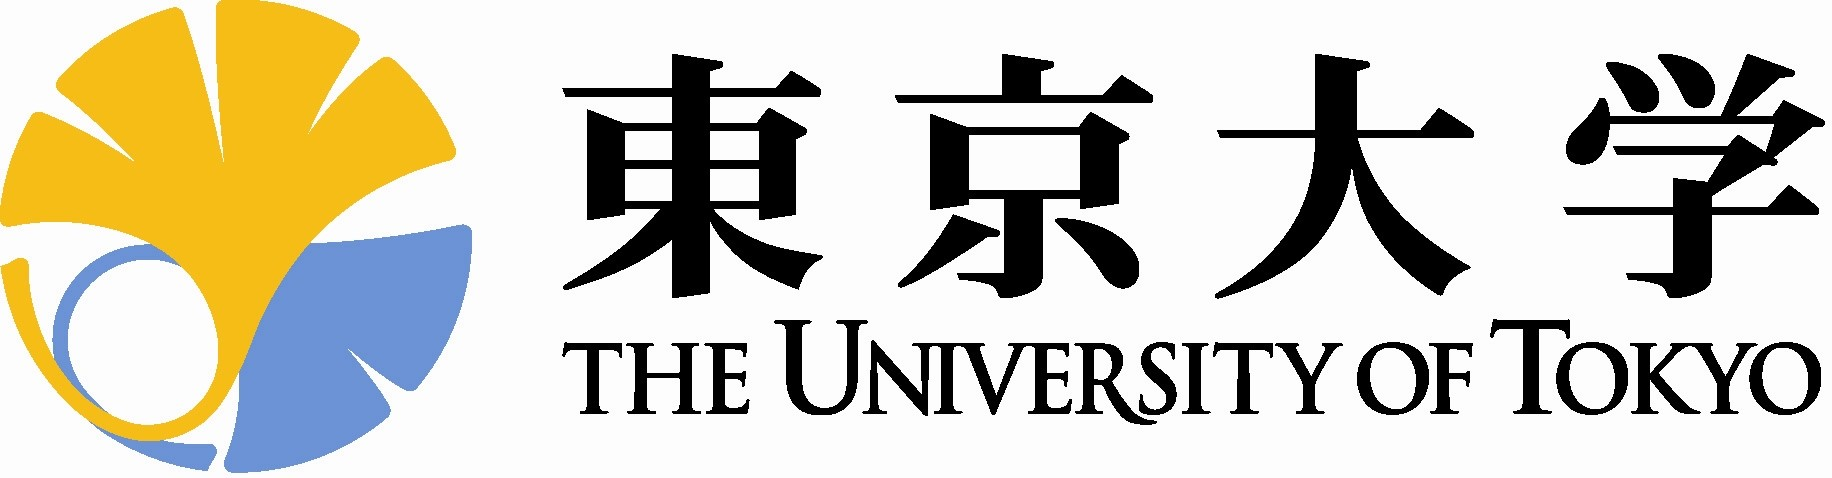 TokyoUniv_logo.jpg